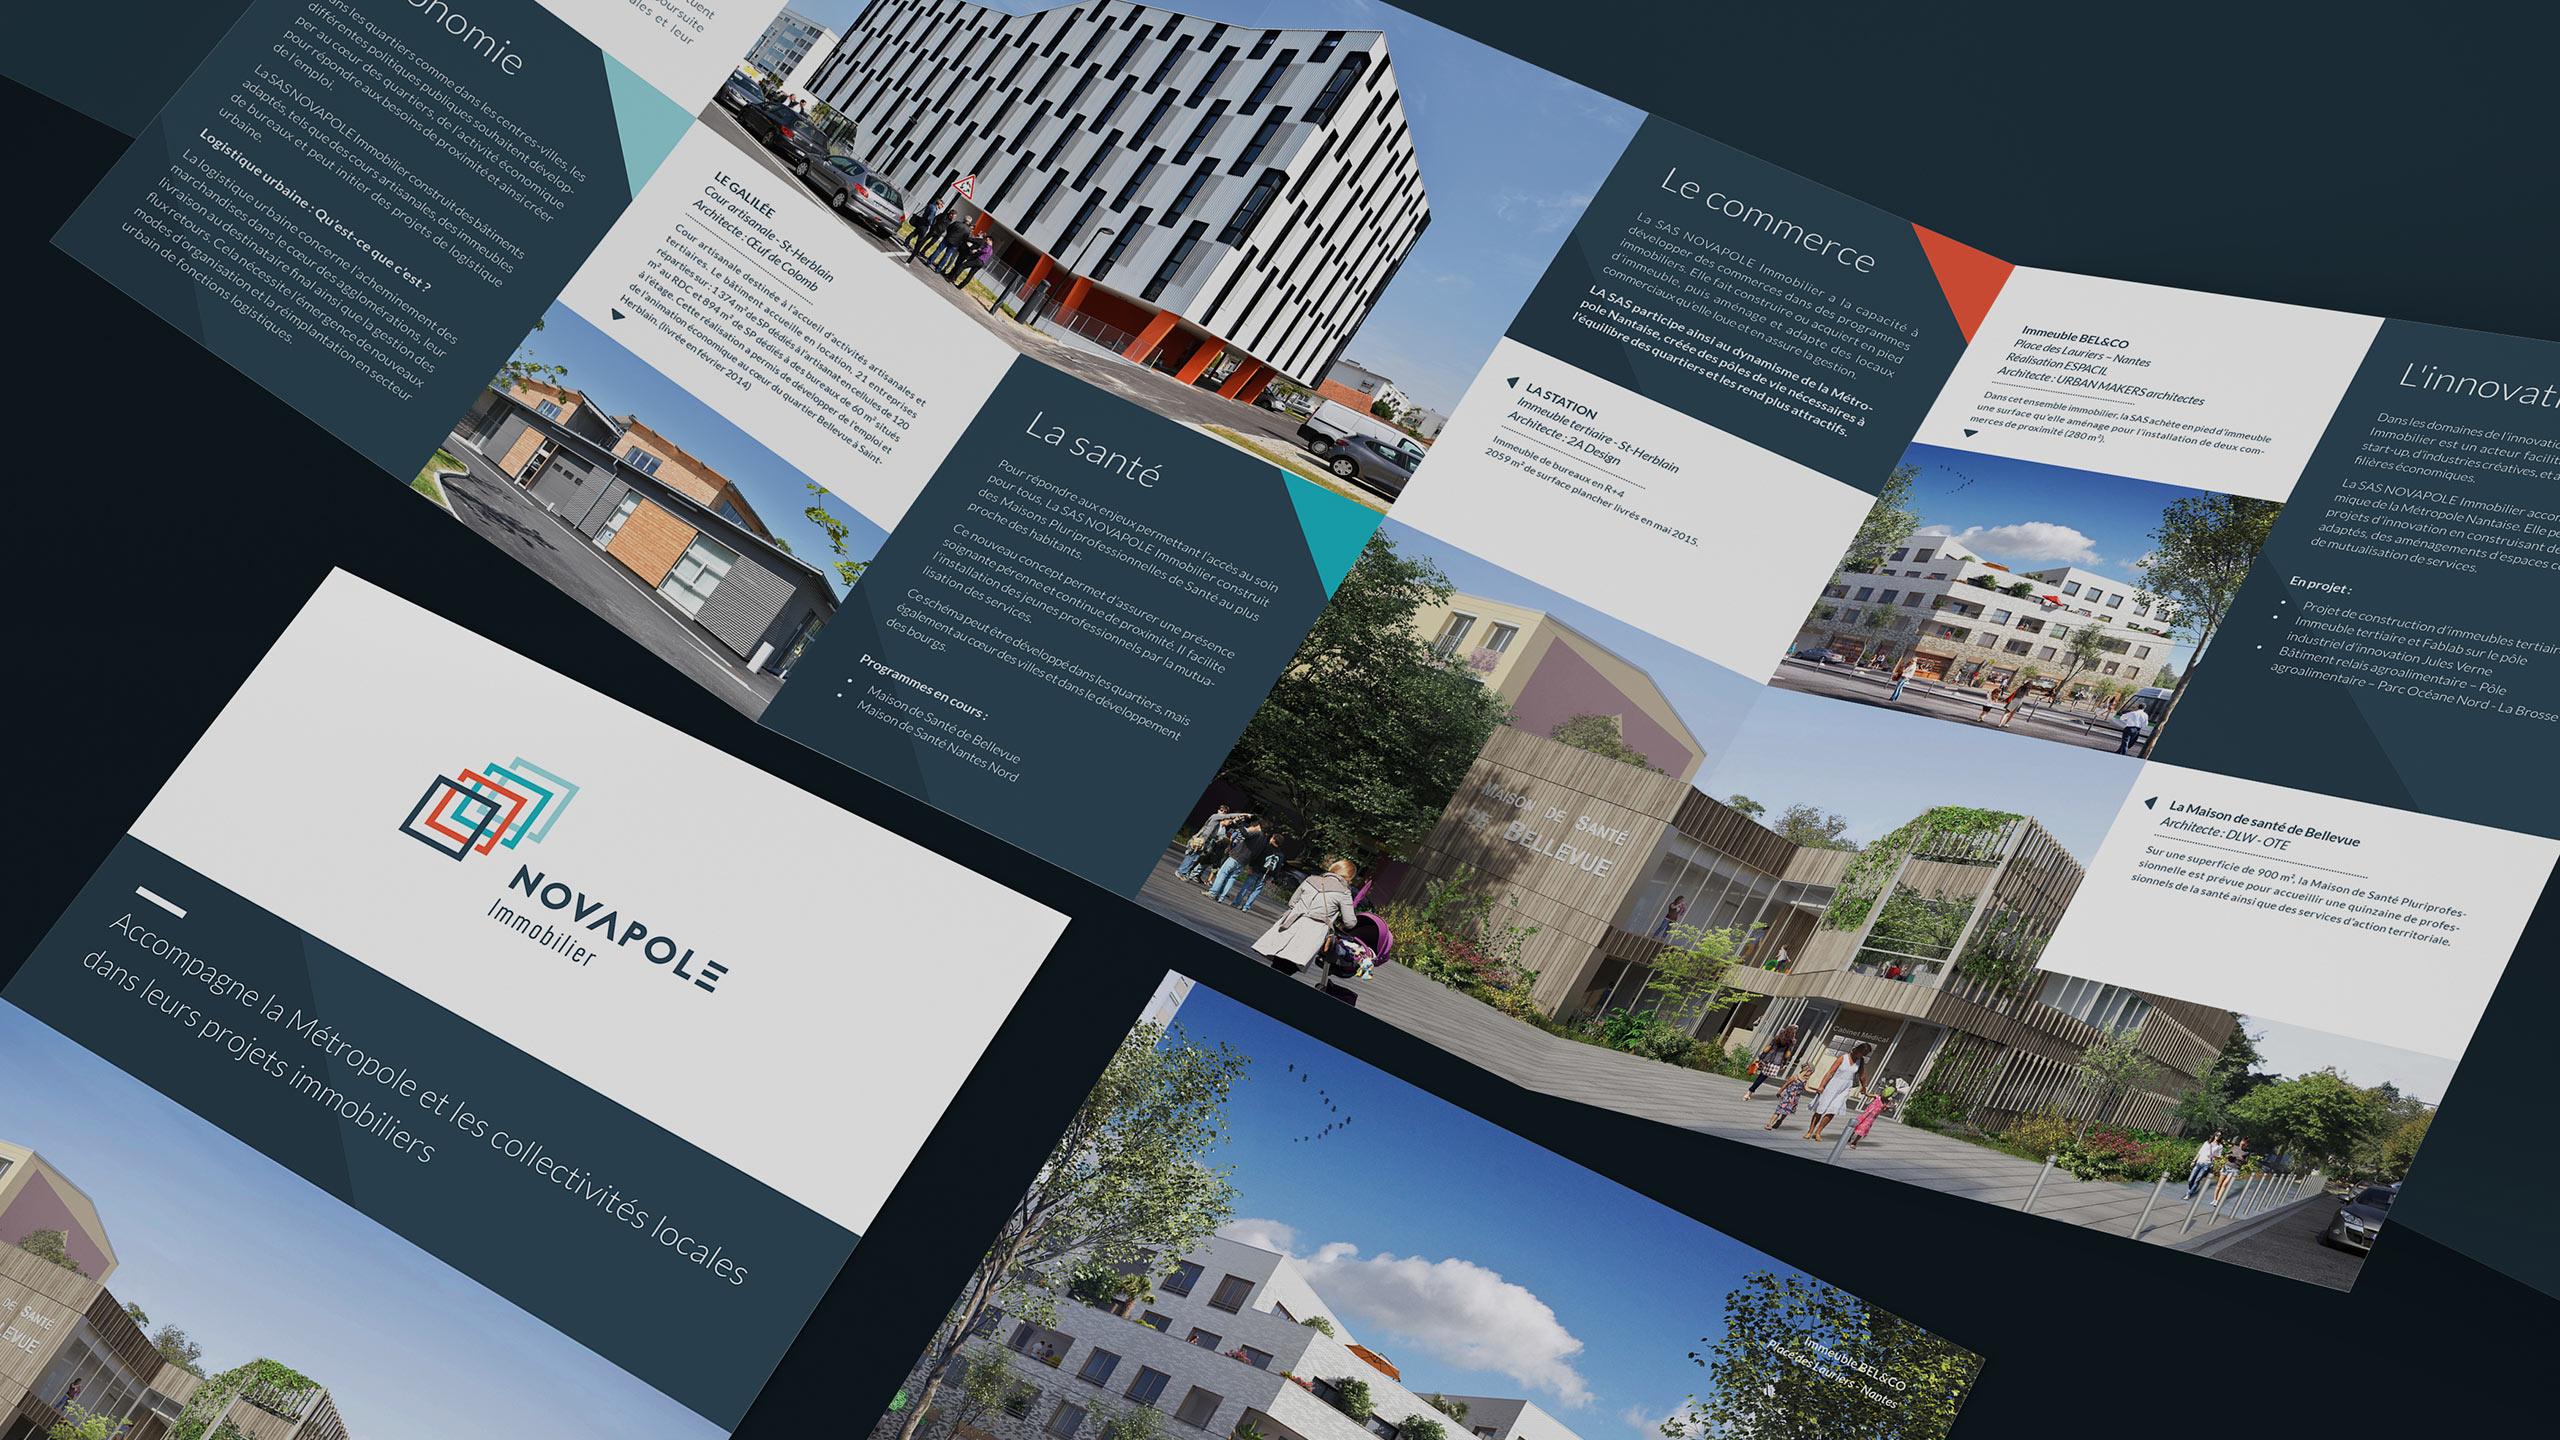 antoine-cornou-brochure-editorial-design